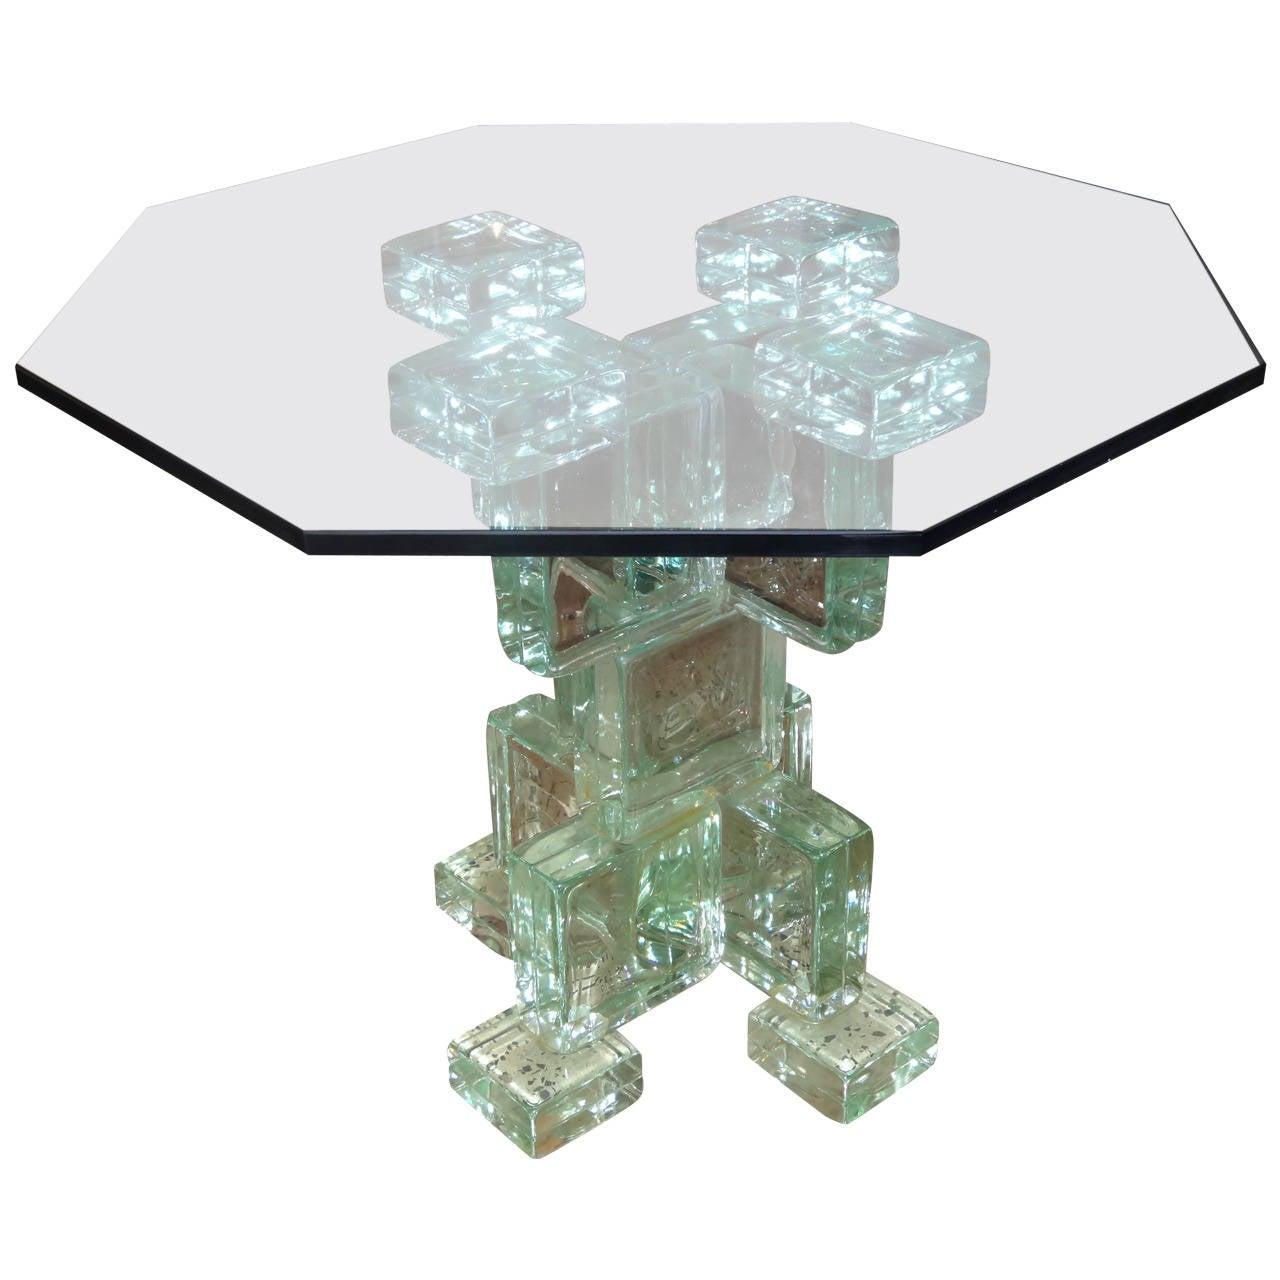 Glass Block Table At 1stdibs